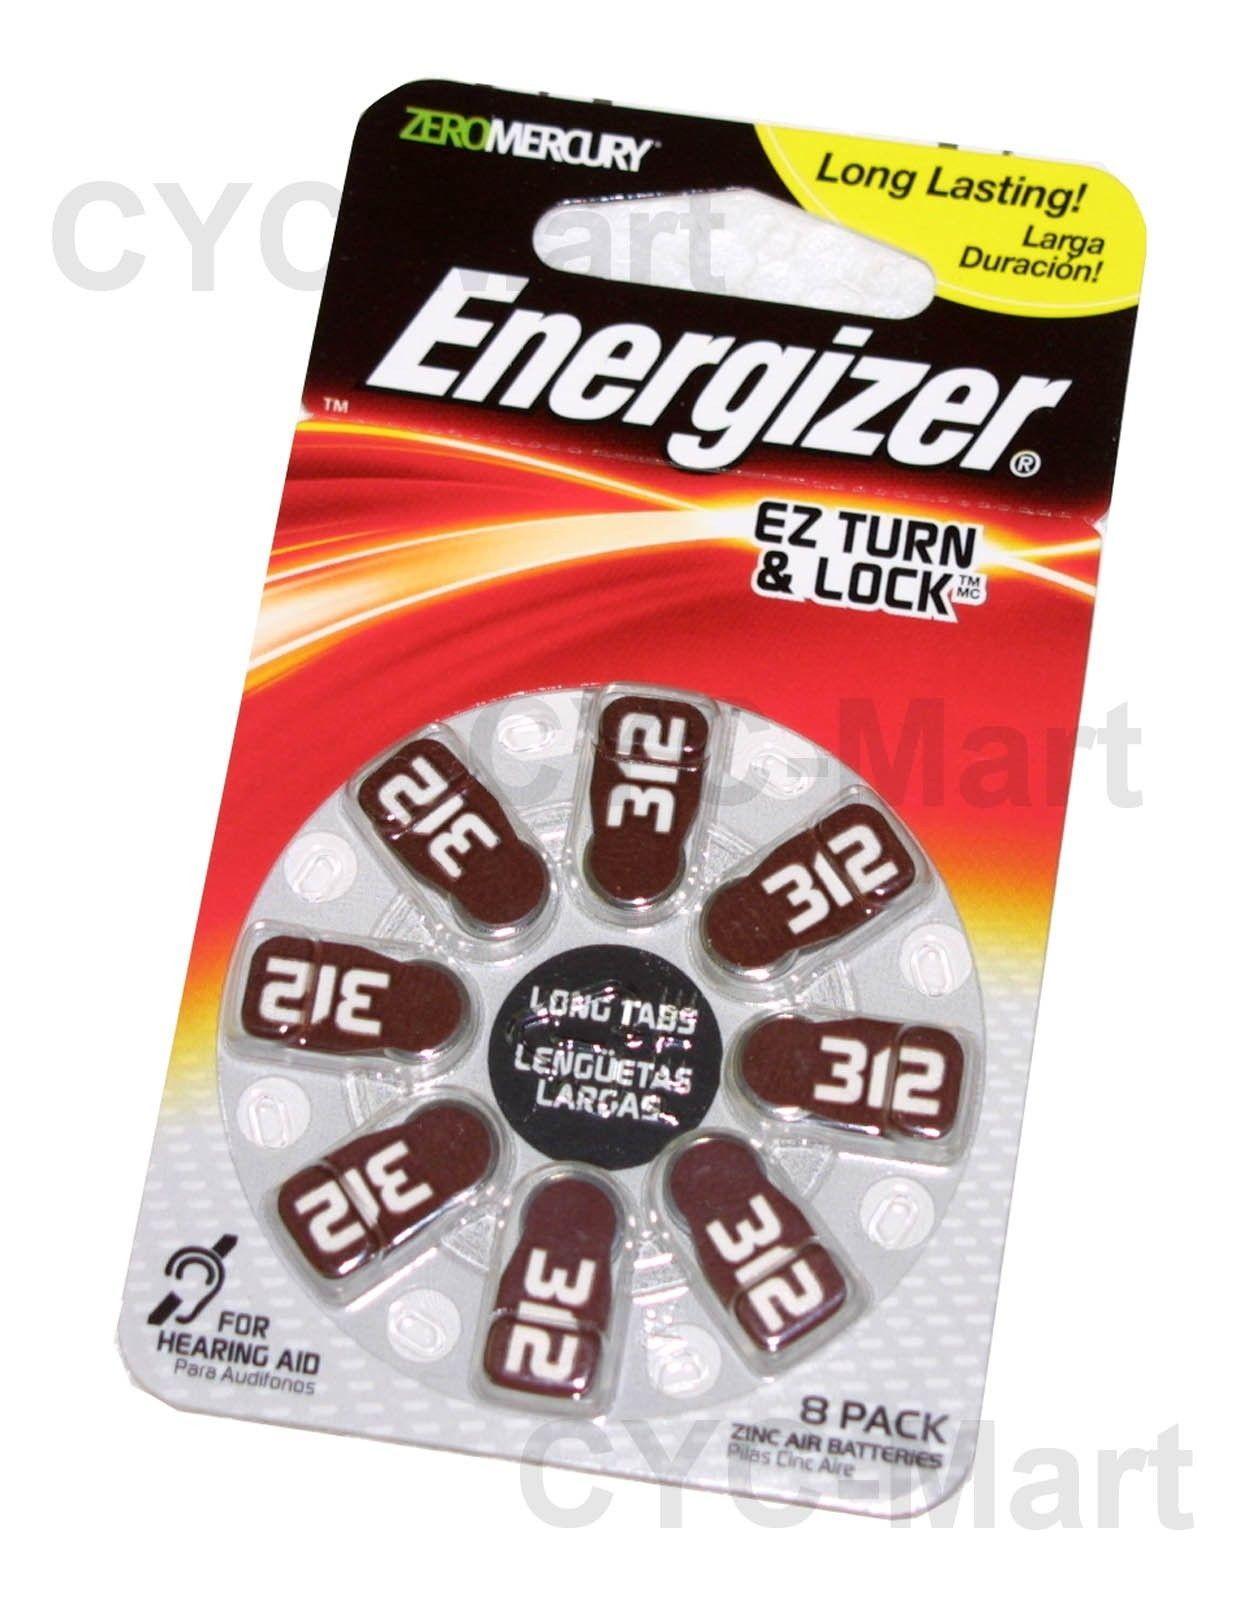 8pcs Energizer Hearing Aid Battery Az312 And 50 Similar Items E92 Aaa Bp 4 Pr41 Made In Germany